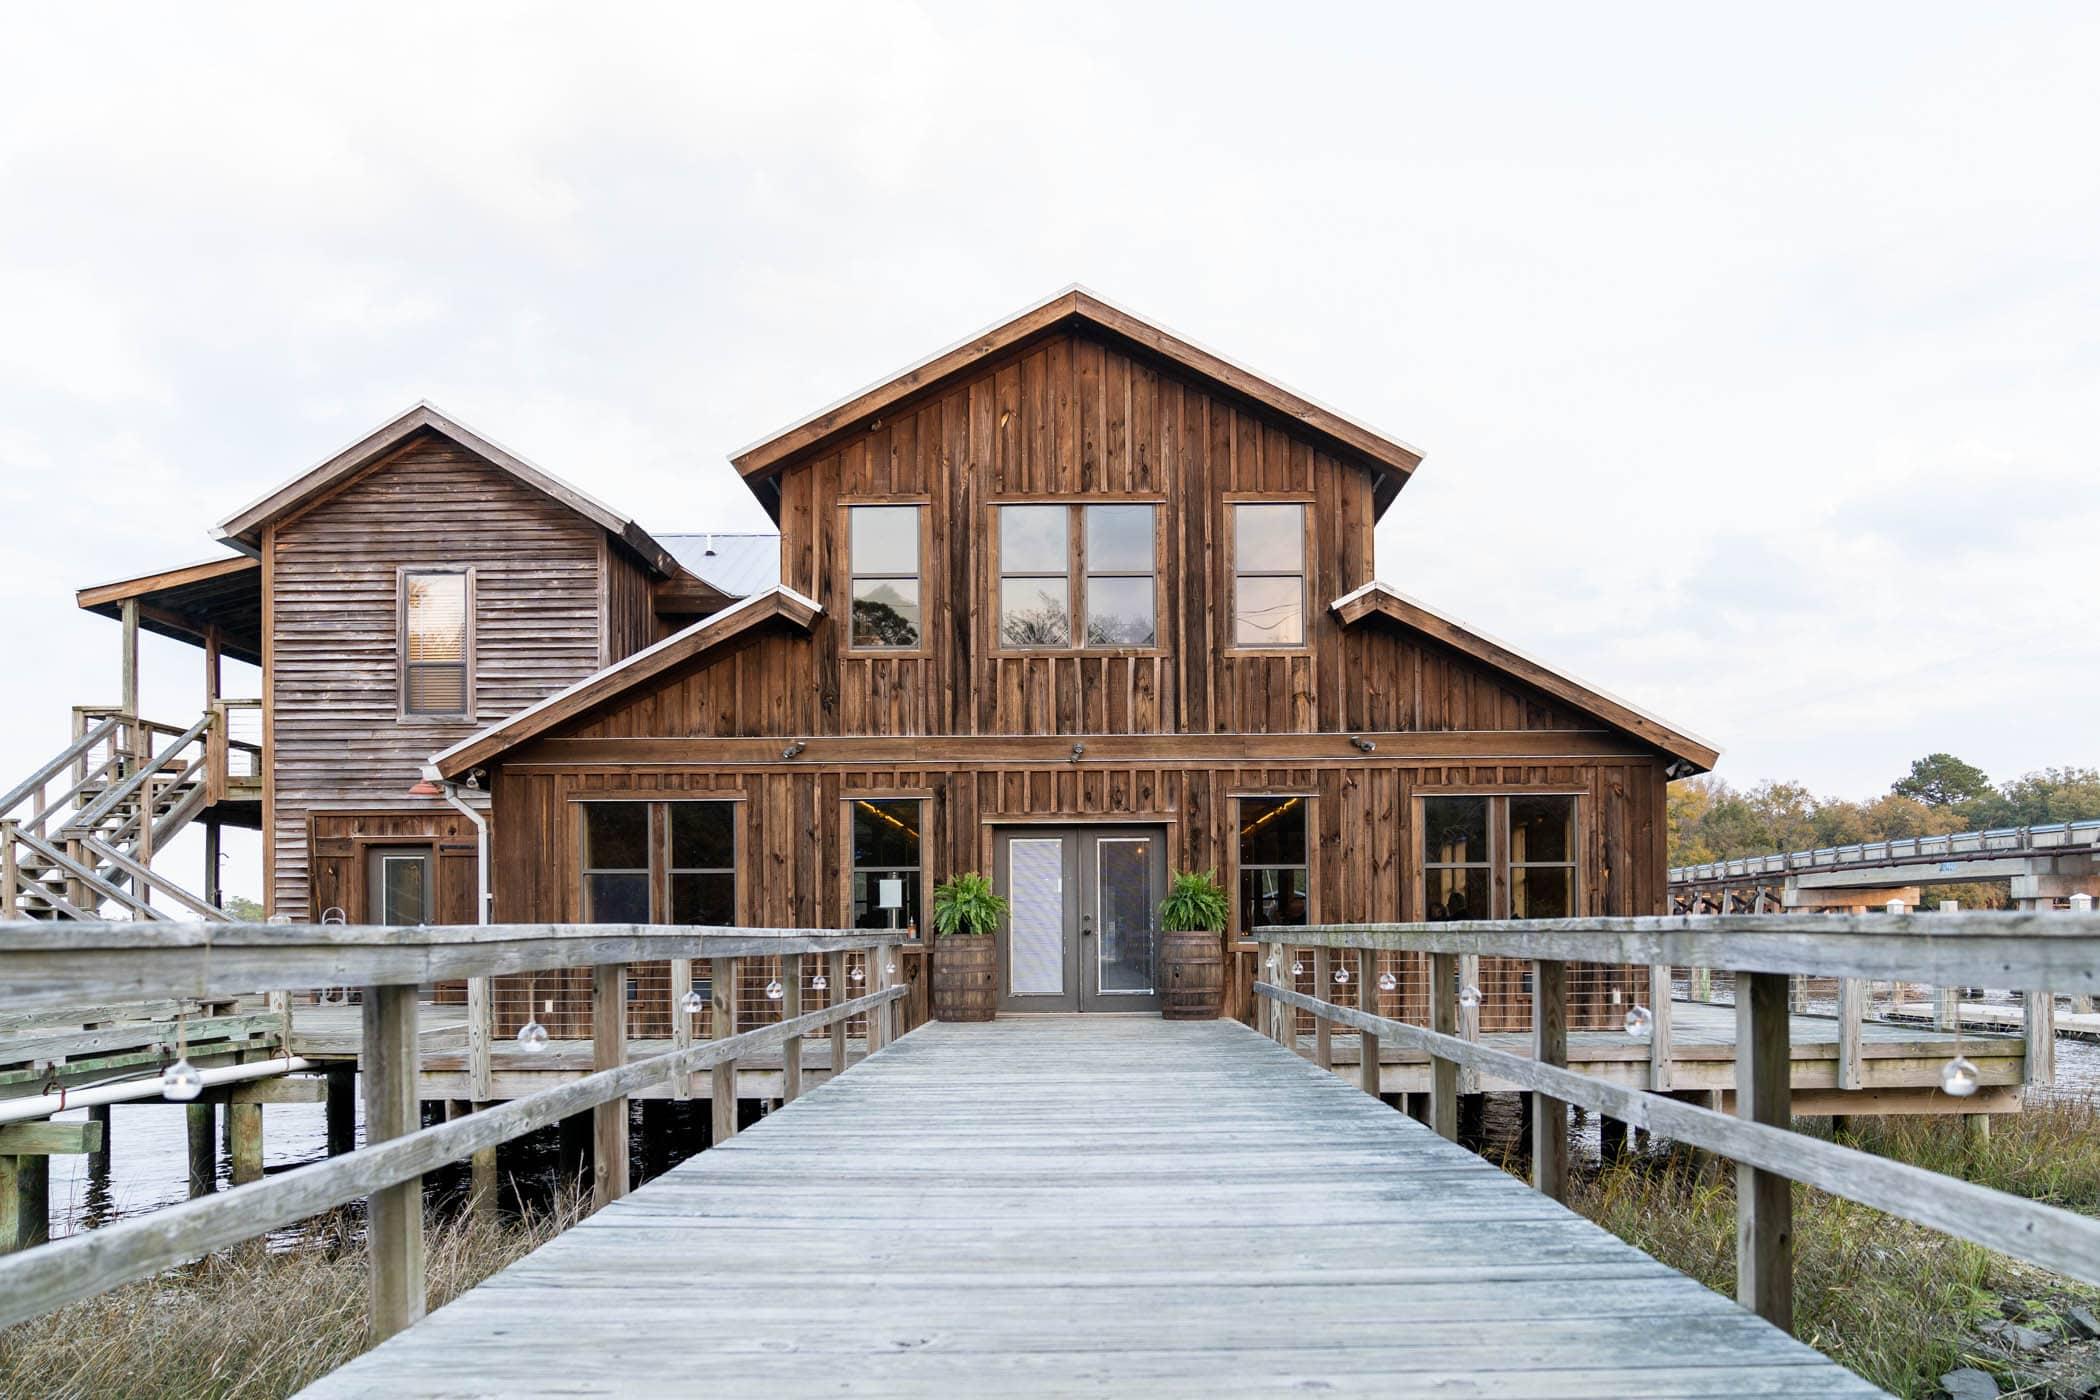 Wedding Venue, Beaufort South Carolina, Lucy Creek Dockhouse